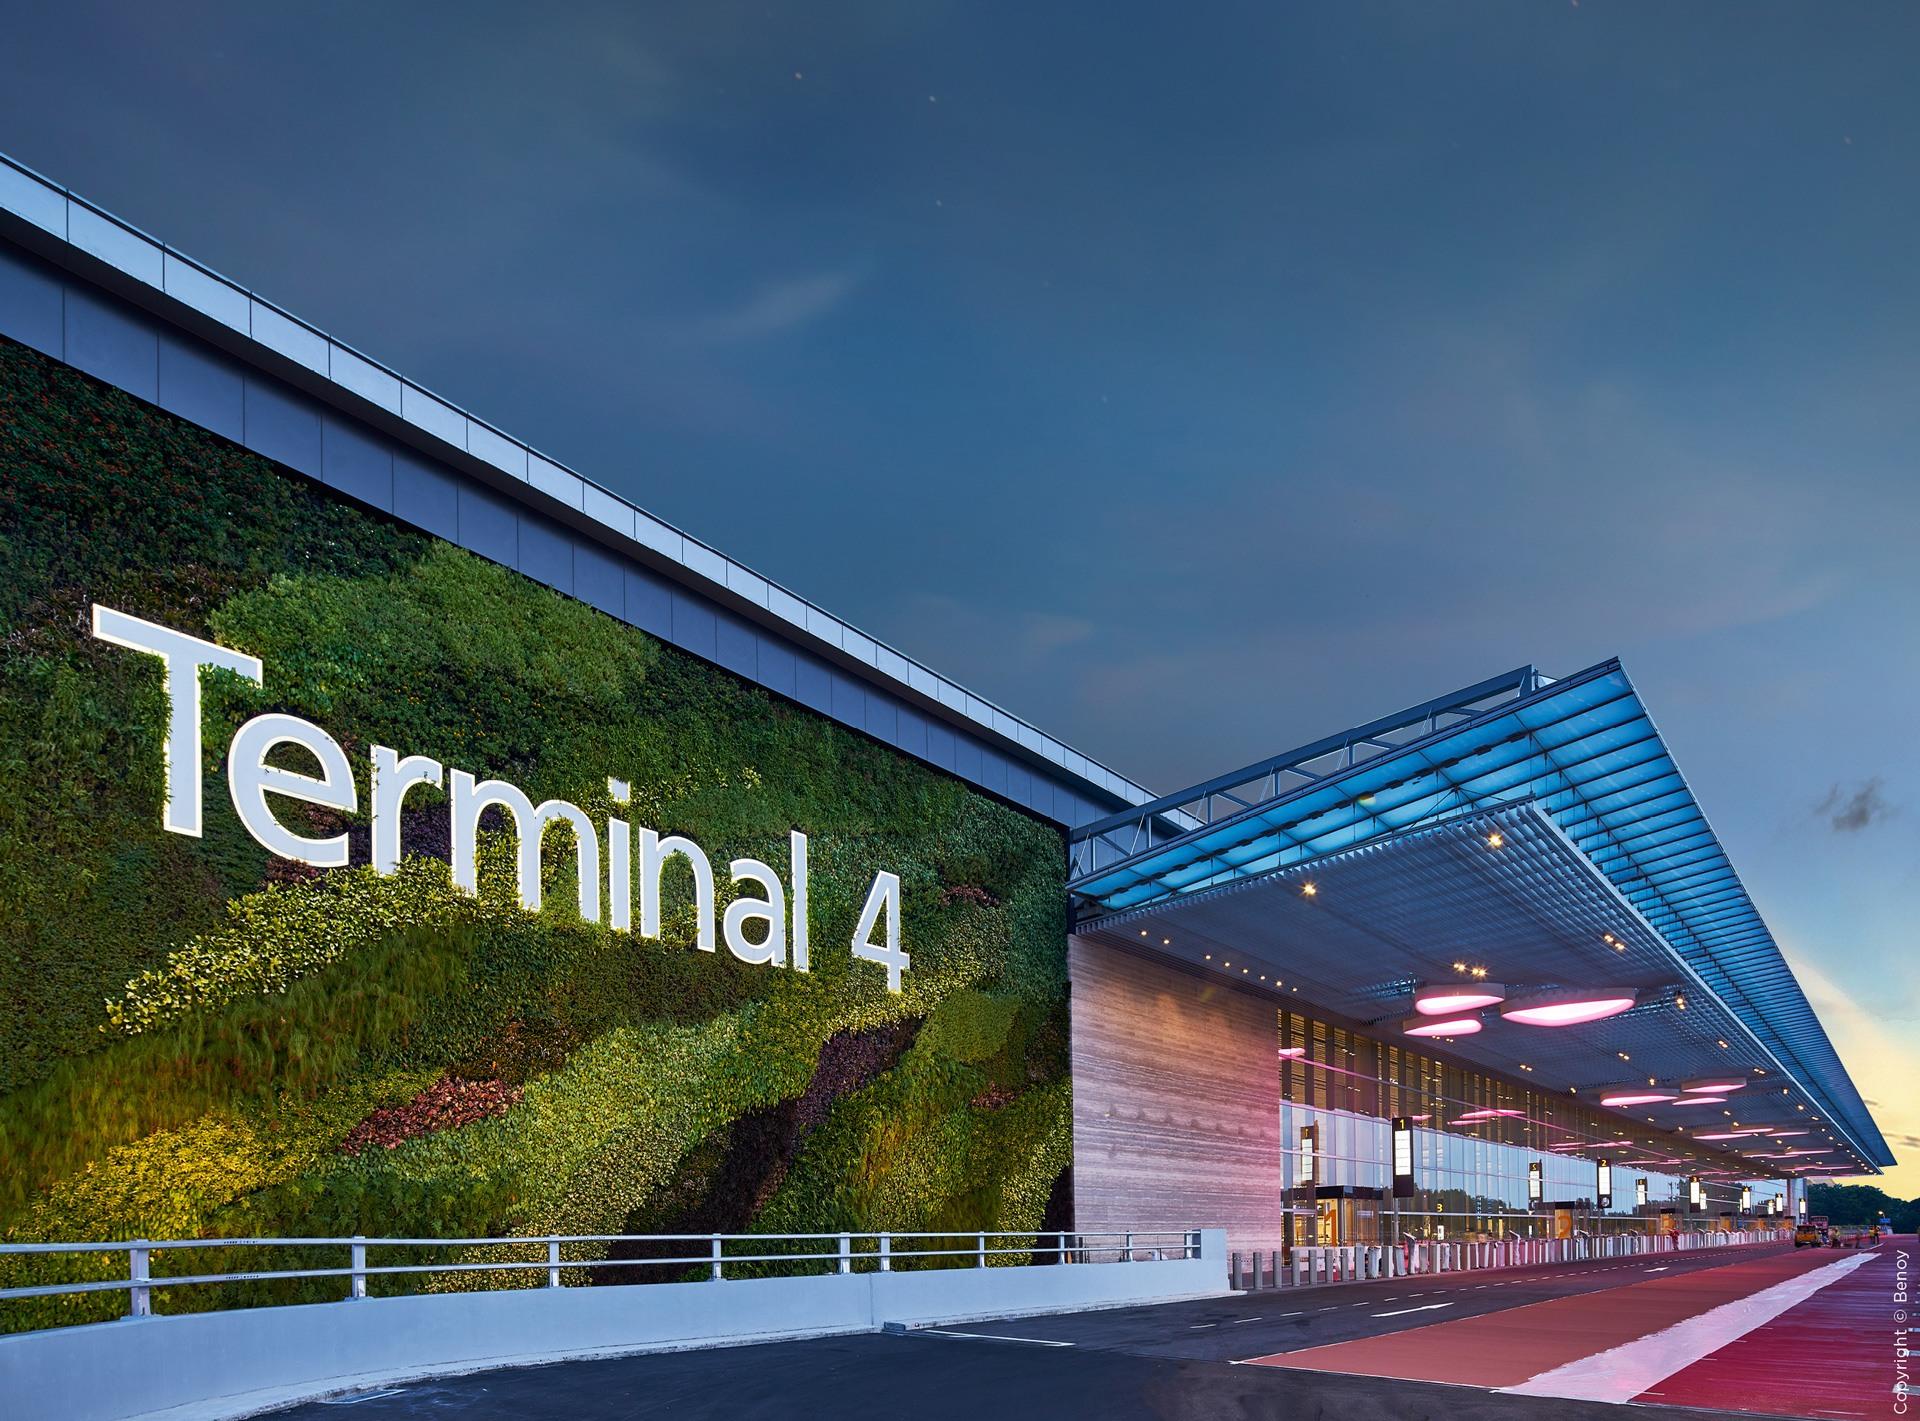 Changi Airport Terminal 4 Saa Group Architects